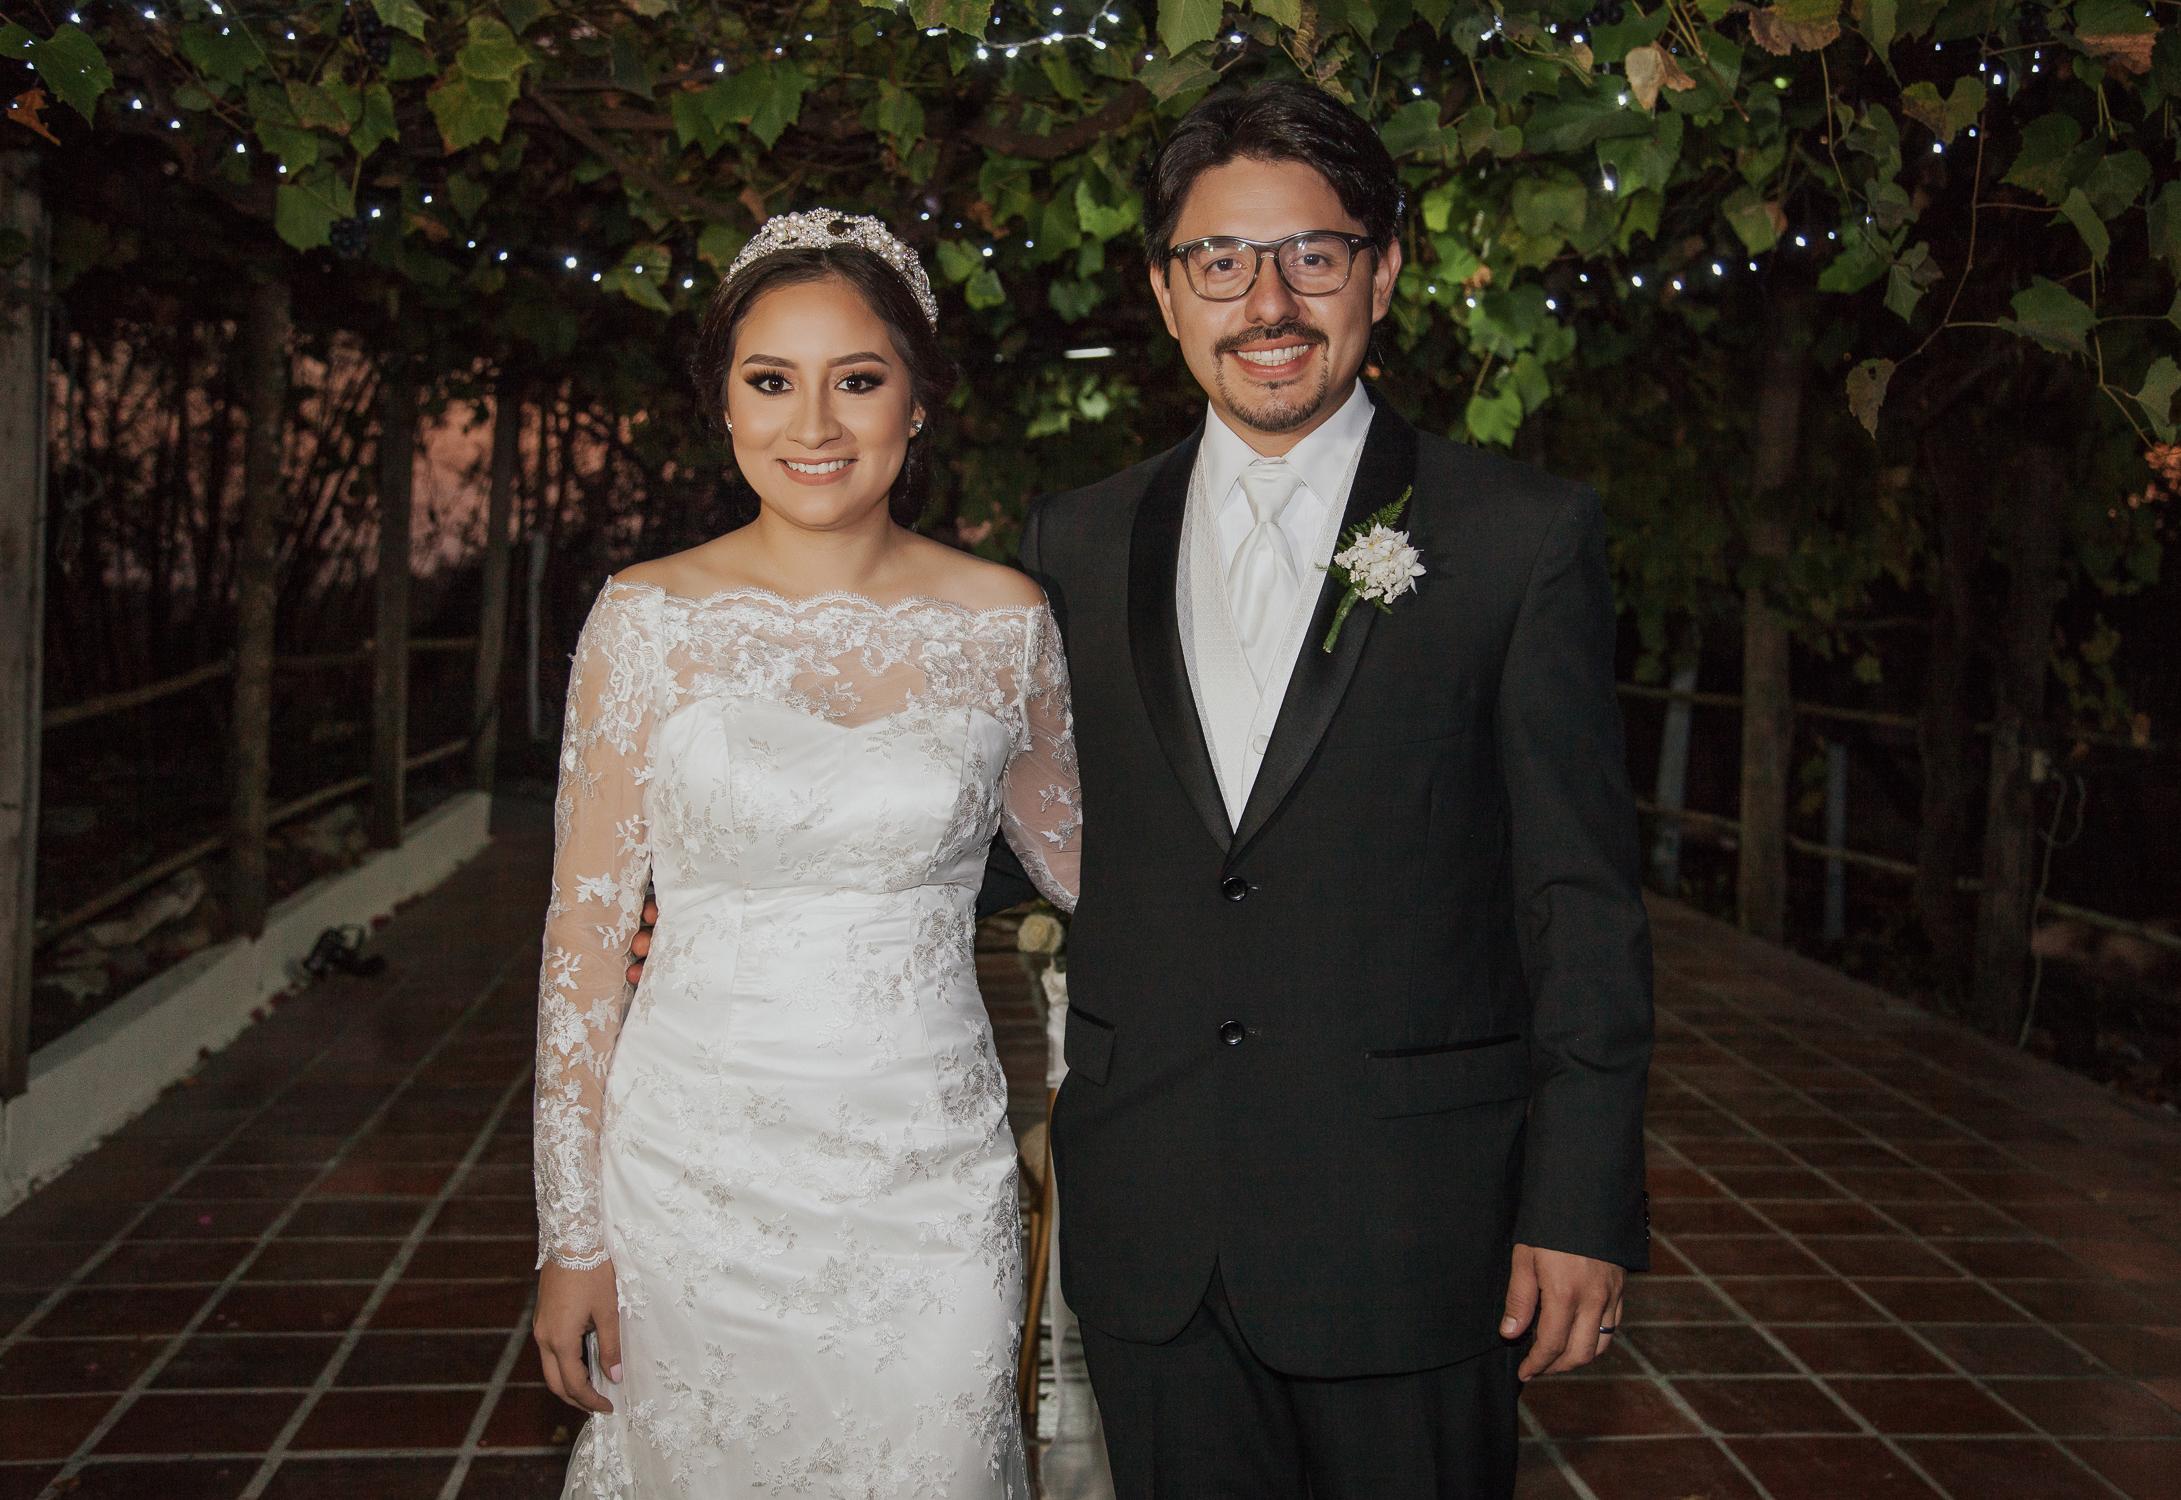 Michelle-Agurto-Fotografia-Bodas-Ecuador-Destination-Wedding-Photographer-Pauli-Edwin-26.JPG